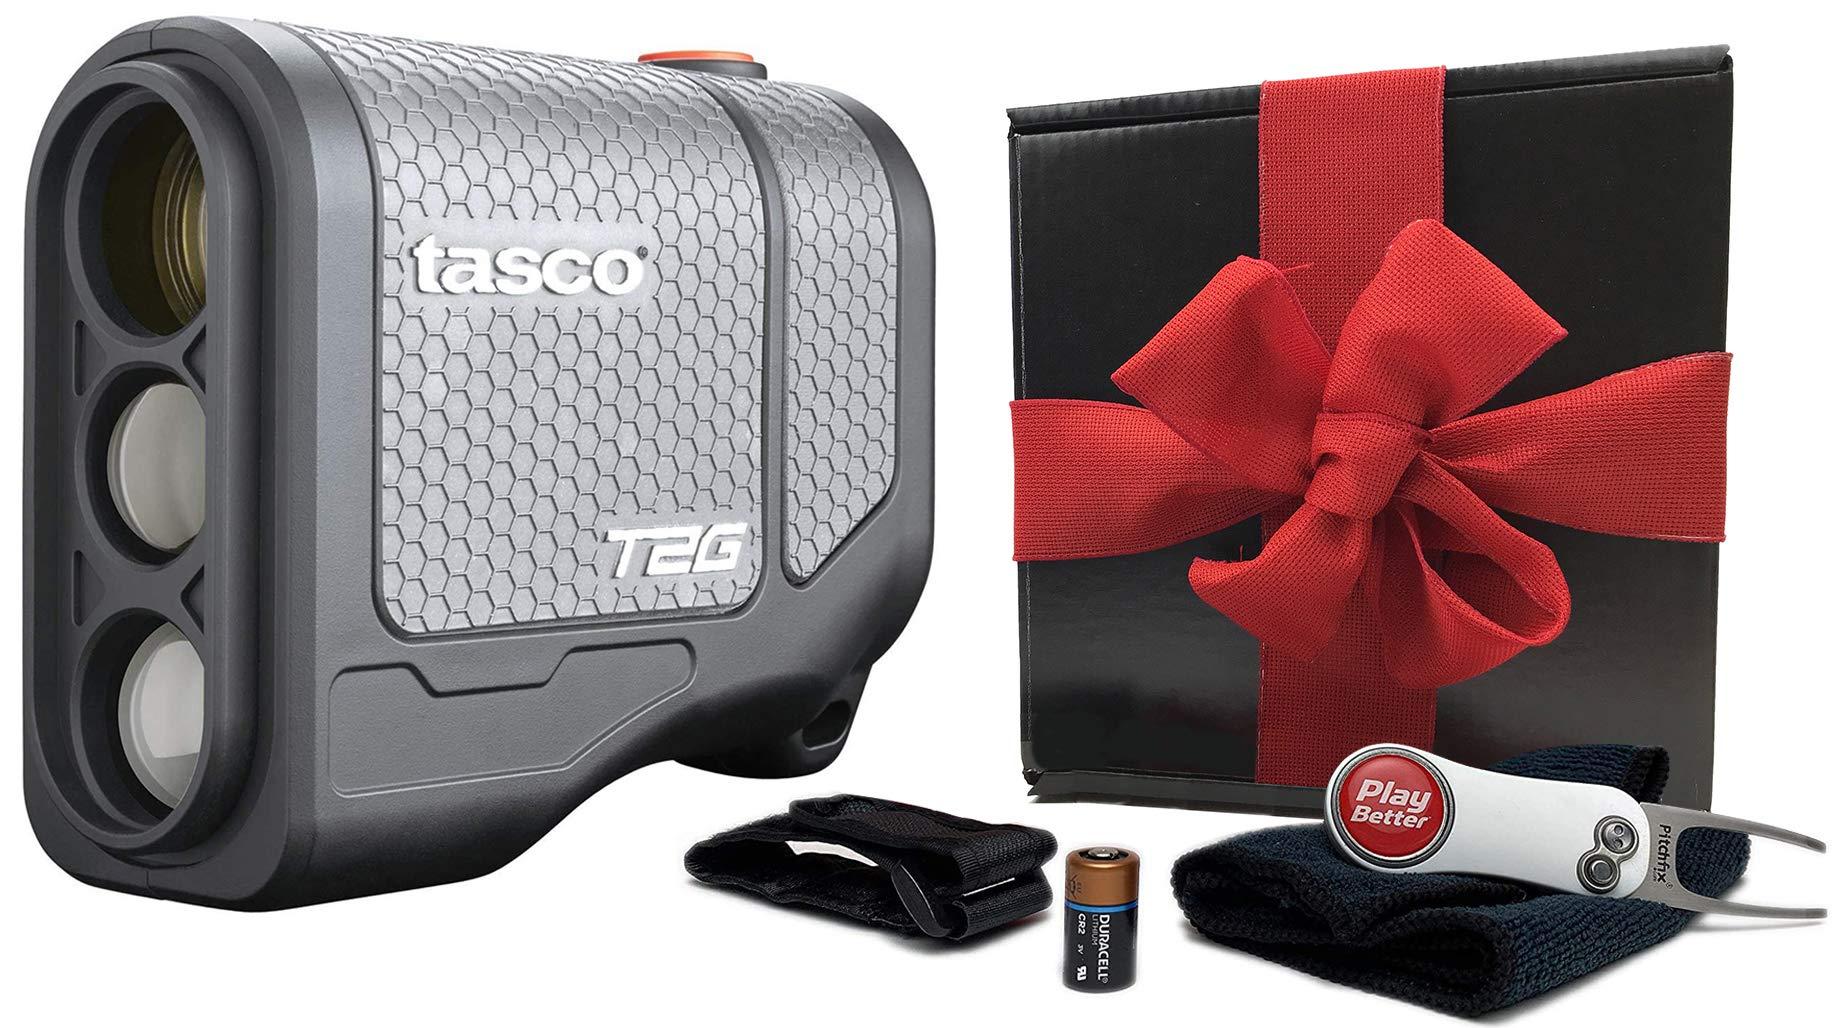 Tasco T2G (Standard Version) Gift Box Bundle | +Cart Mount, Pitchfix, Microfiber Towel & Extra CR2 Battery | 5X Mag, Scan Mode, | Golf Laser Rangefinder